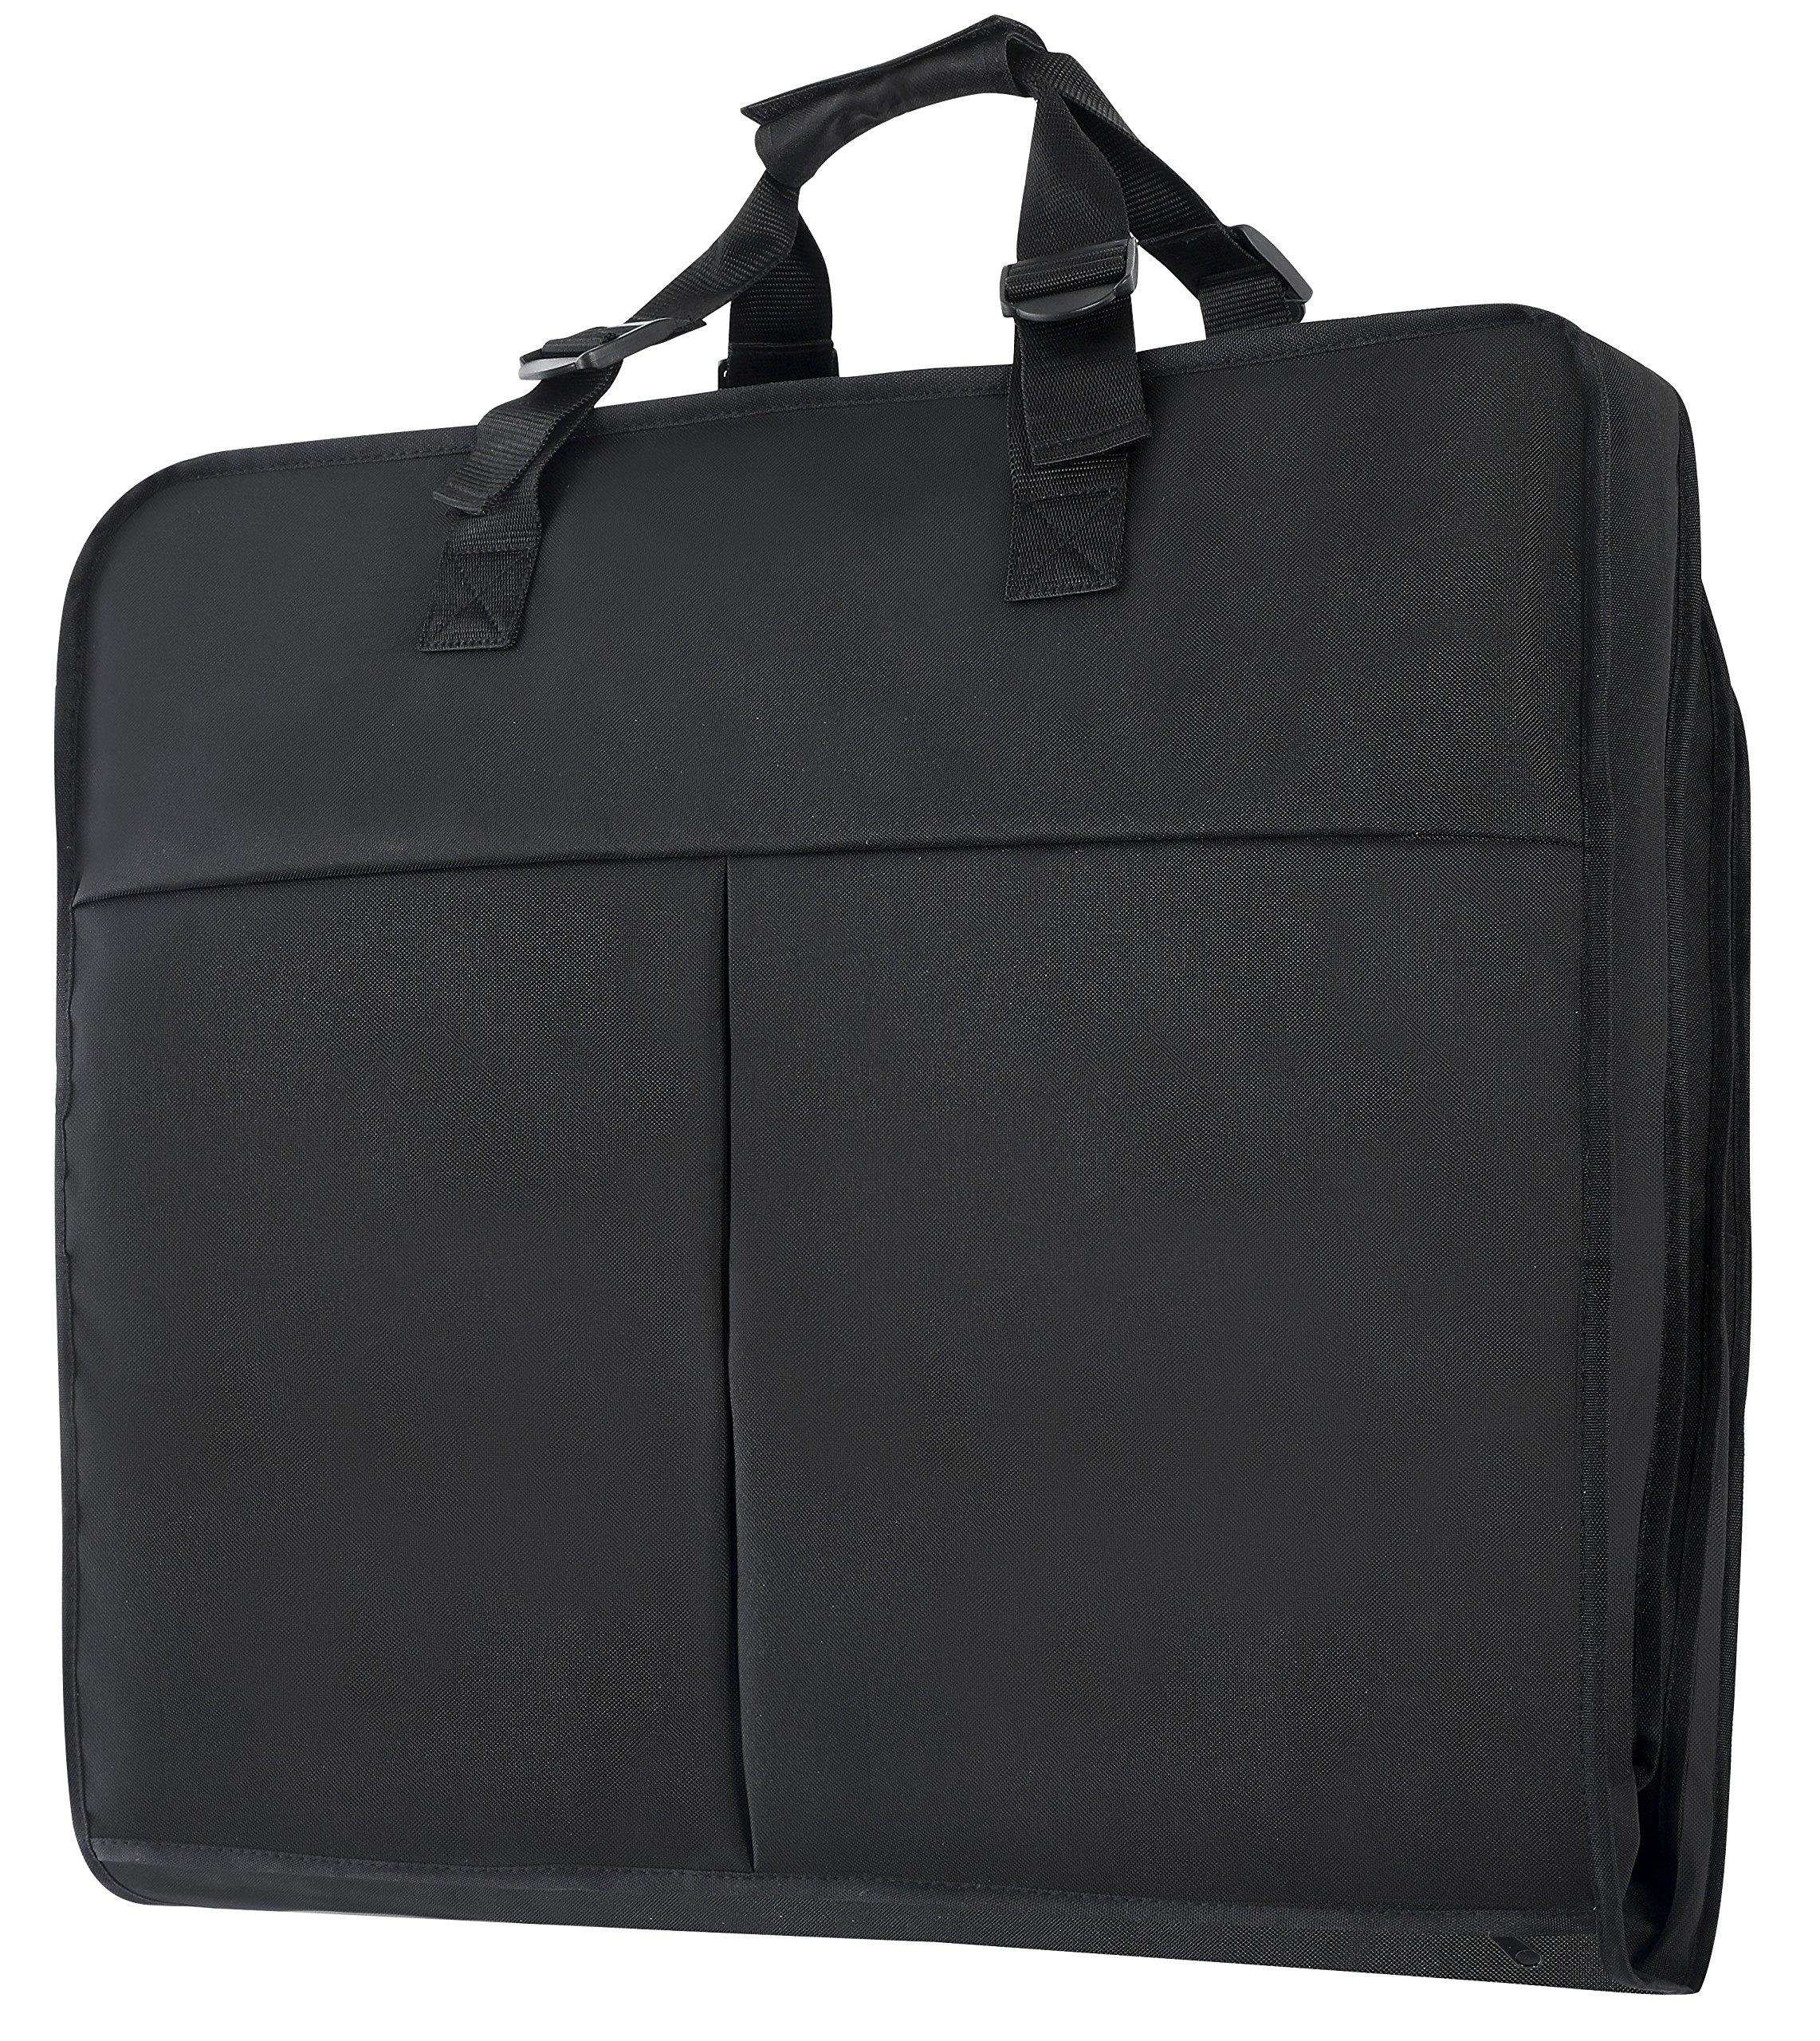 Magictodoor 40 Inch Garment Bag Extra Capacity Garment Bag with Pockets w/Hanging Hook by Magictodoor